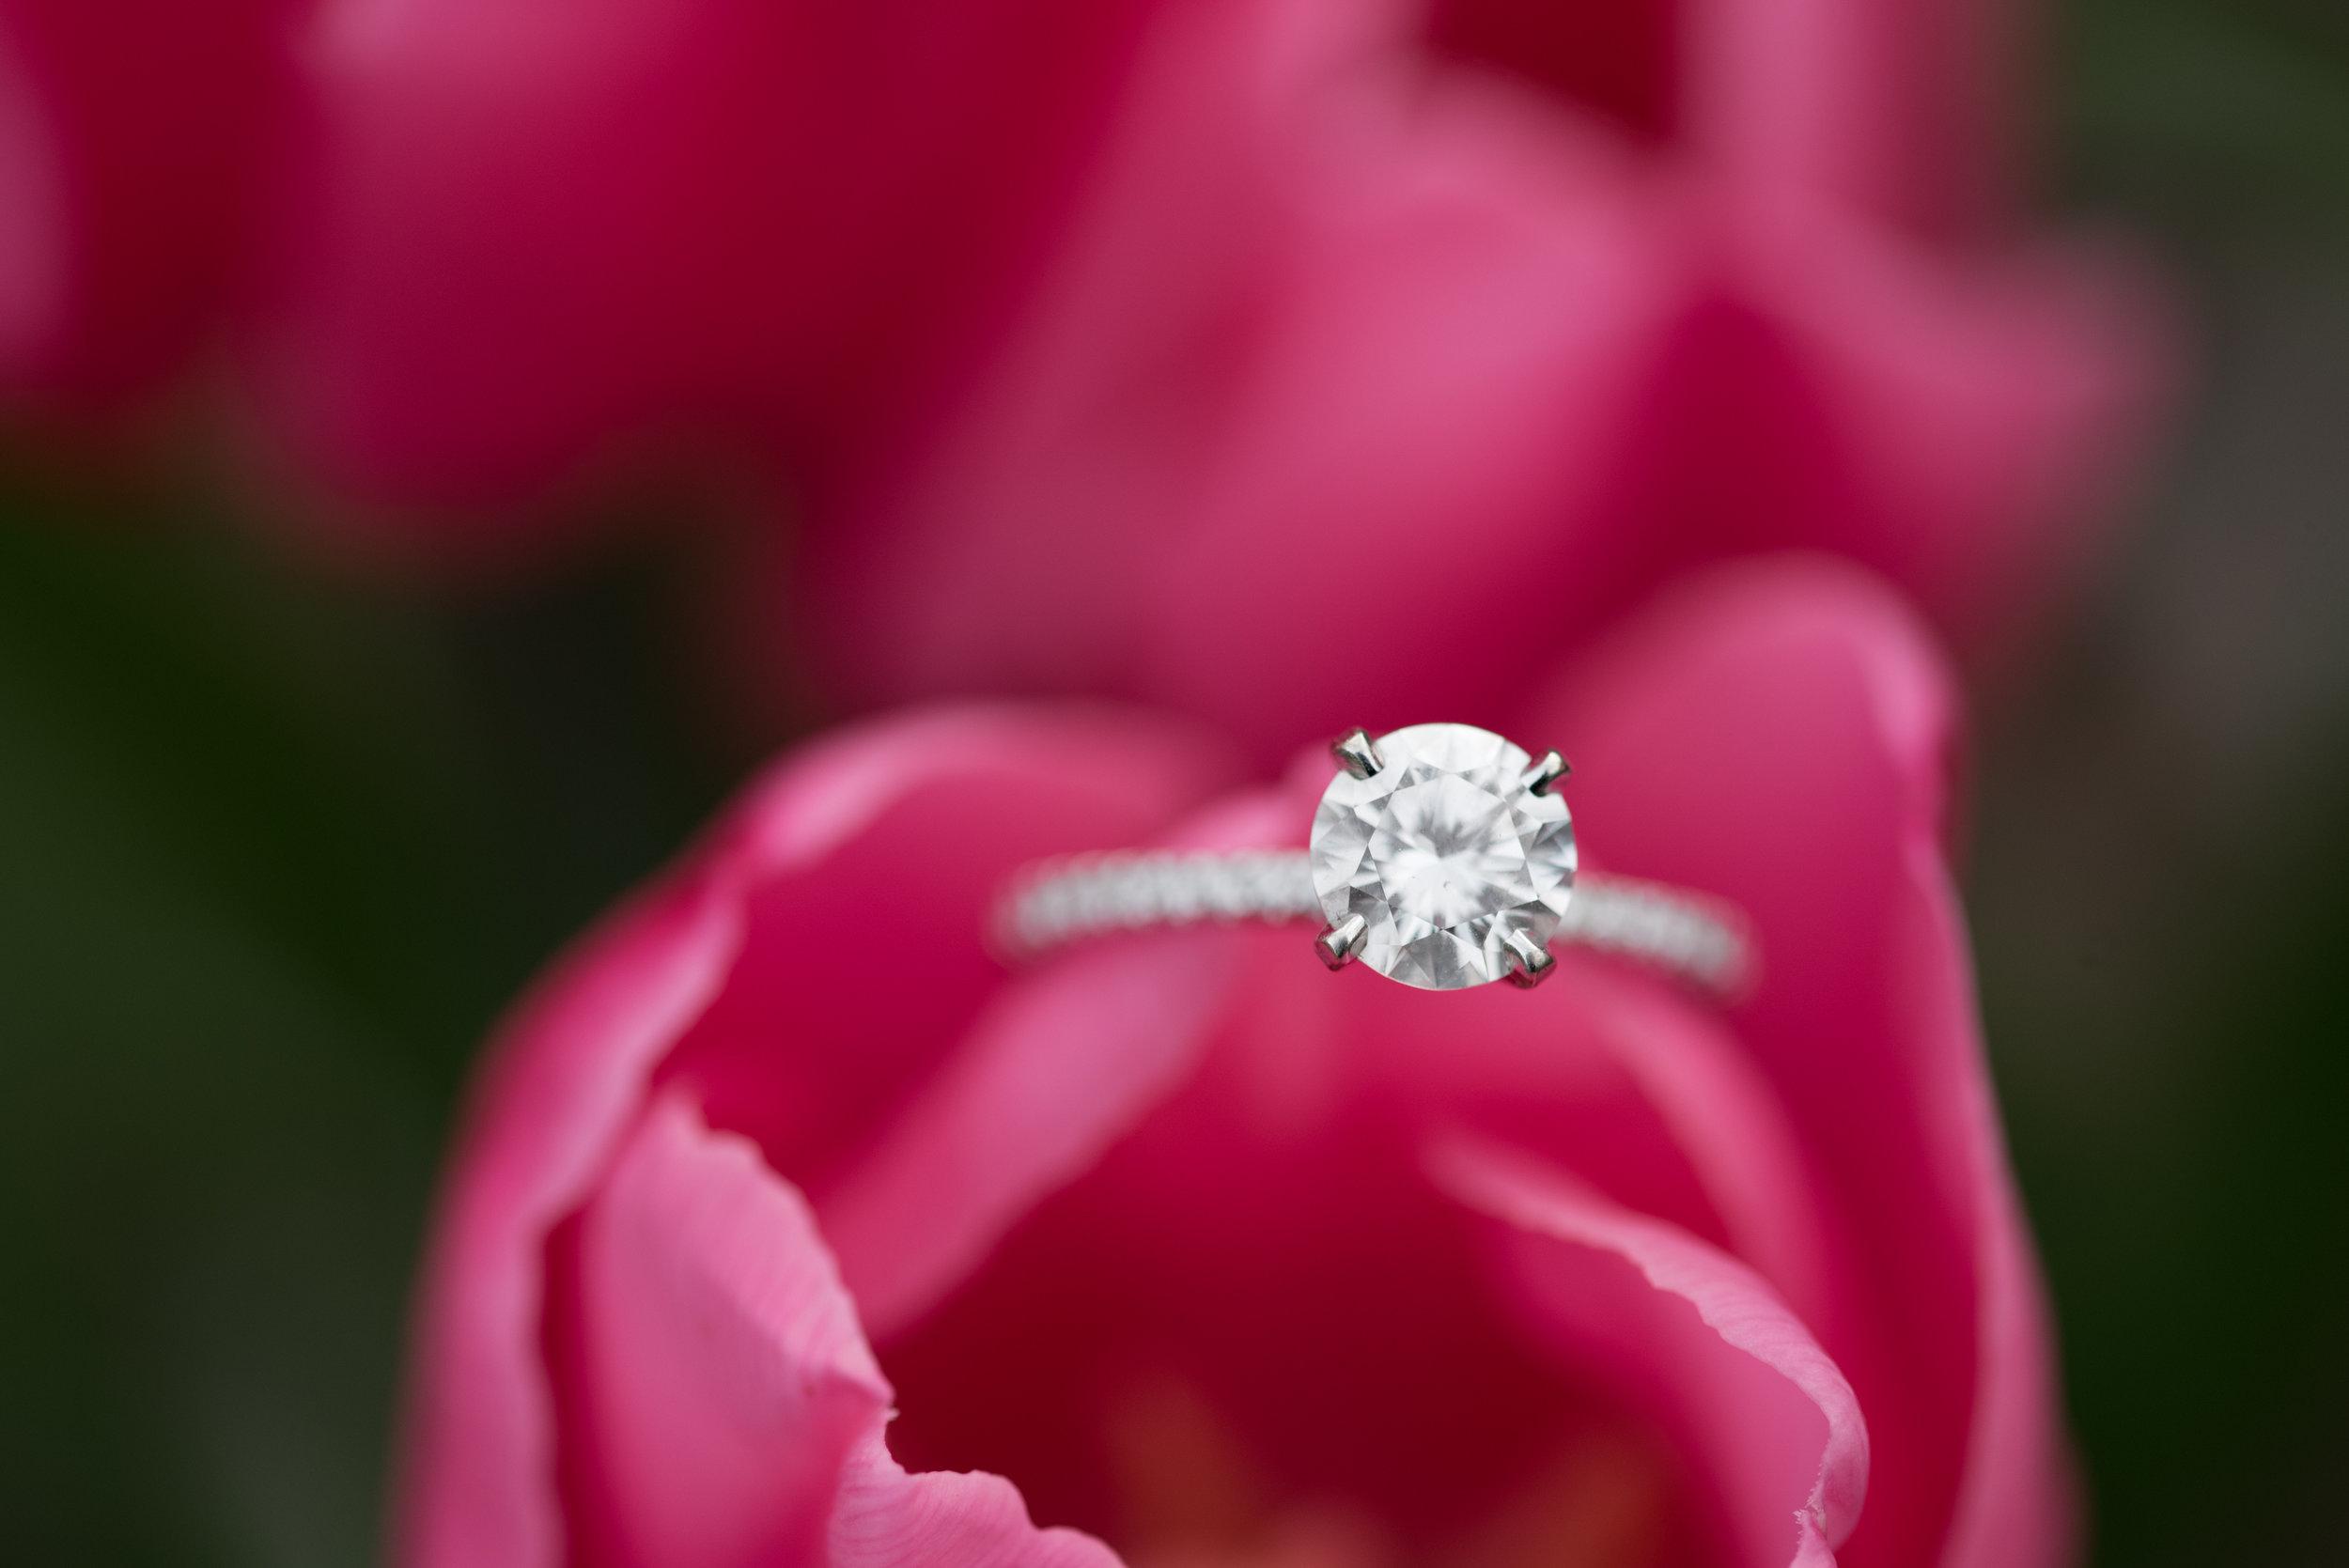 Macro Ring Shot Solitair Diamond Christopher Columbus Park Engagement Boston MA.jpg